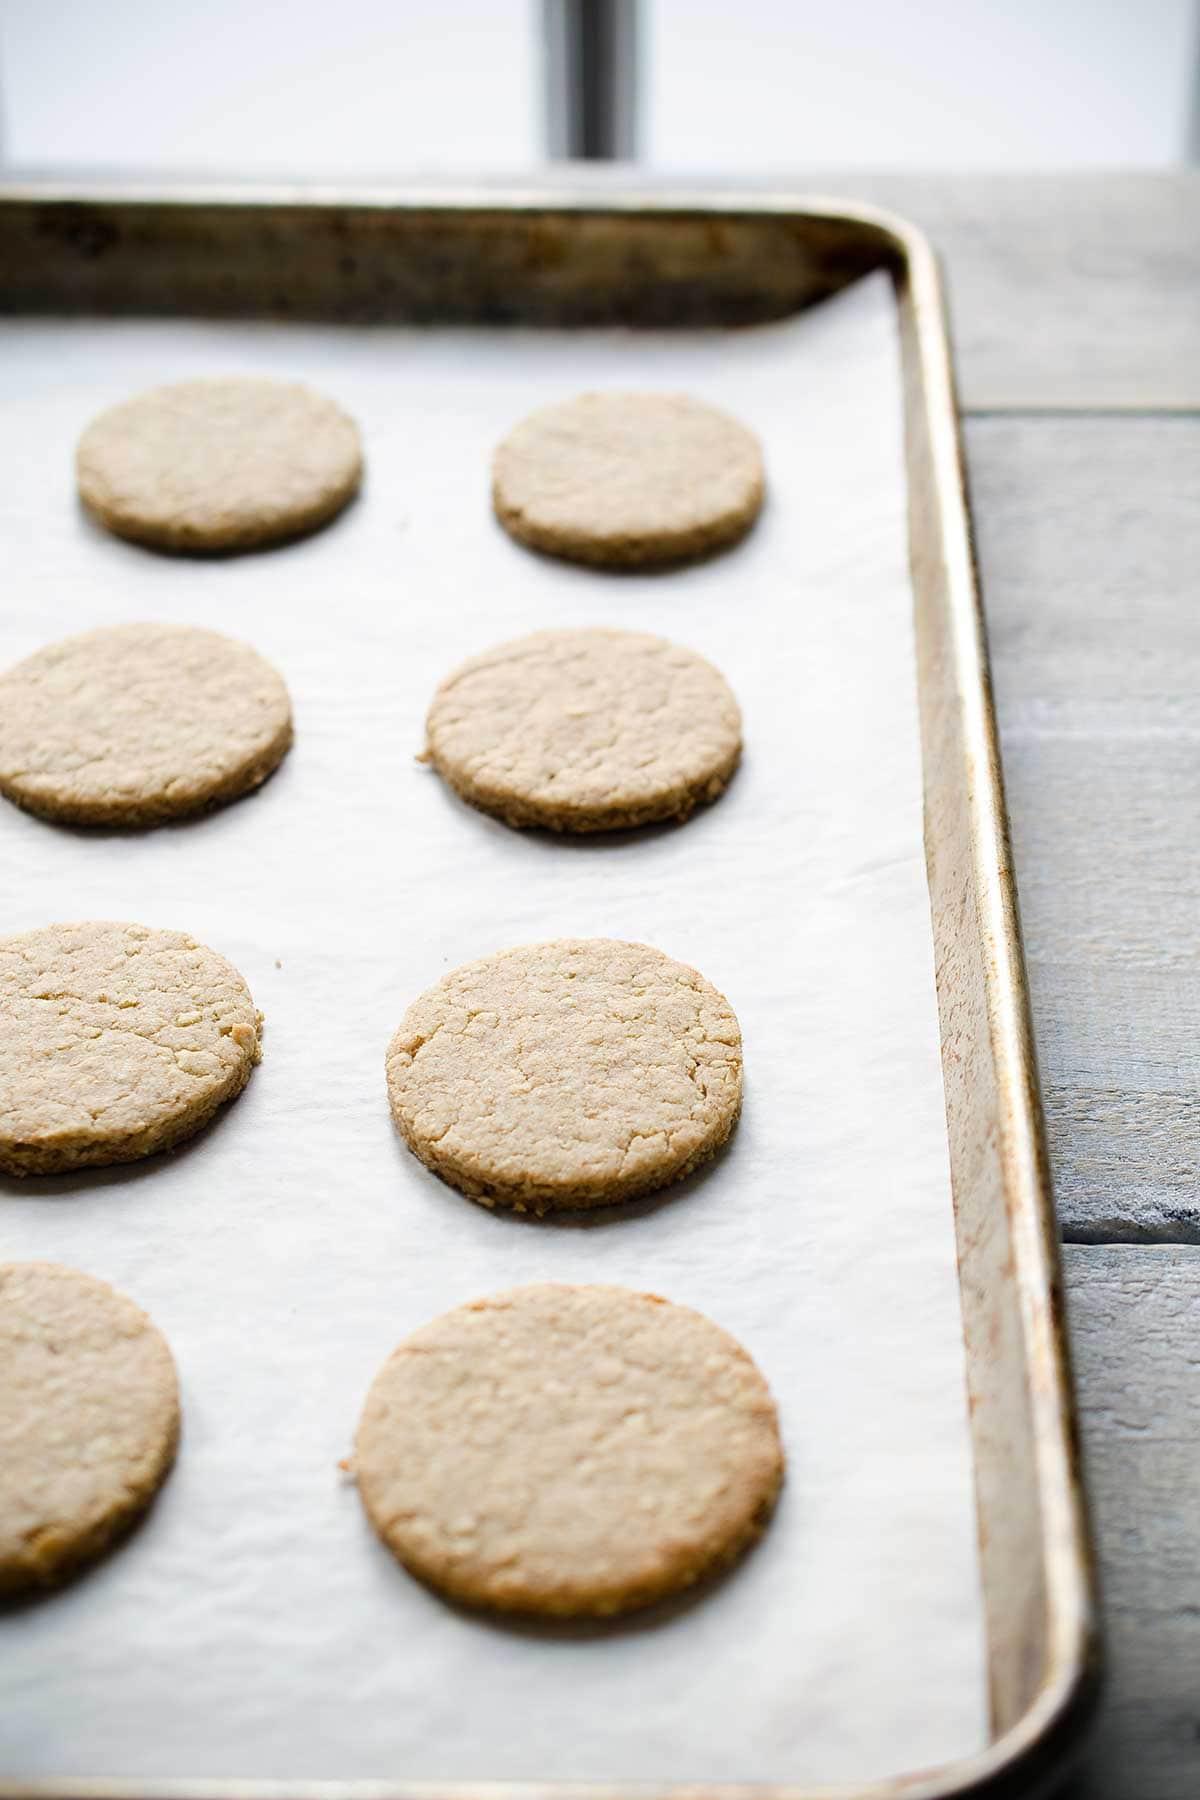 Homemade tea biscuits